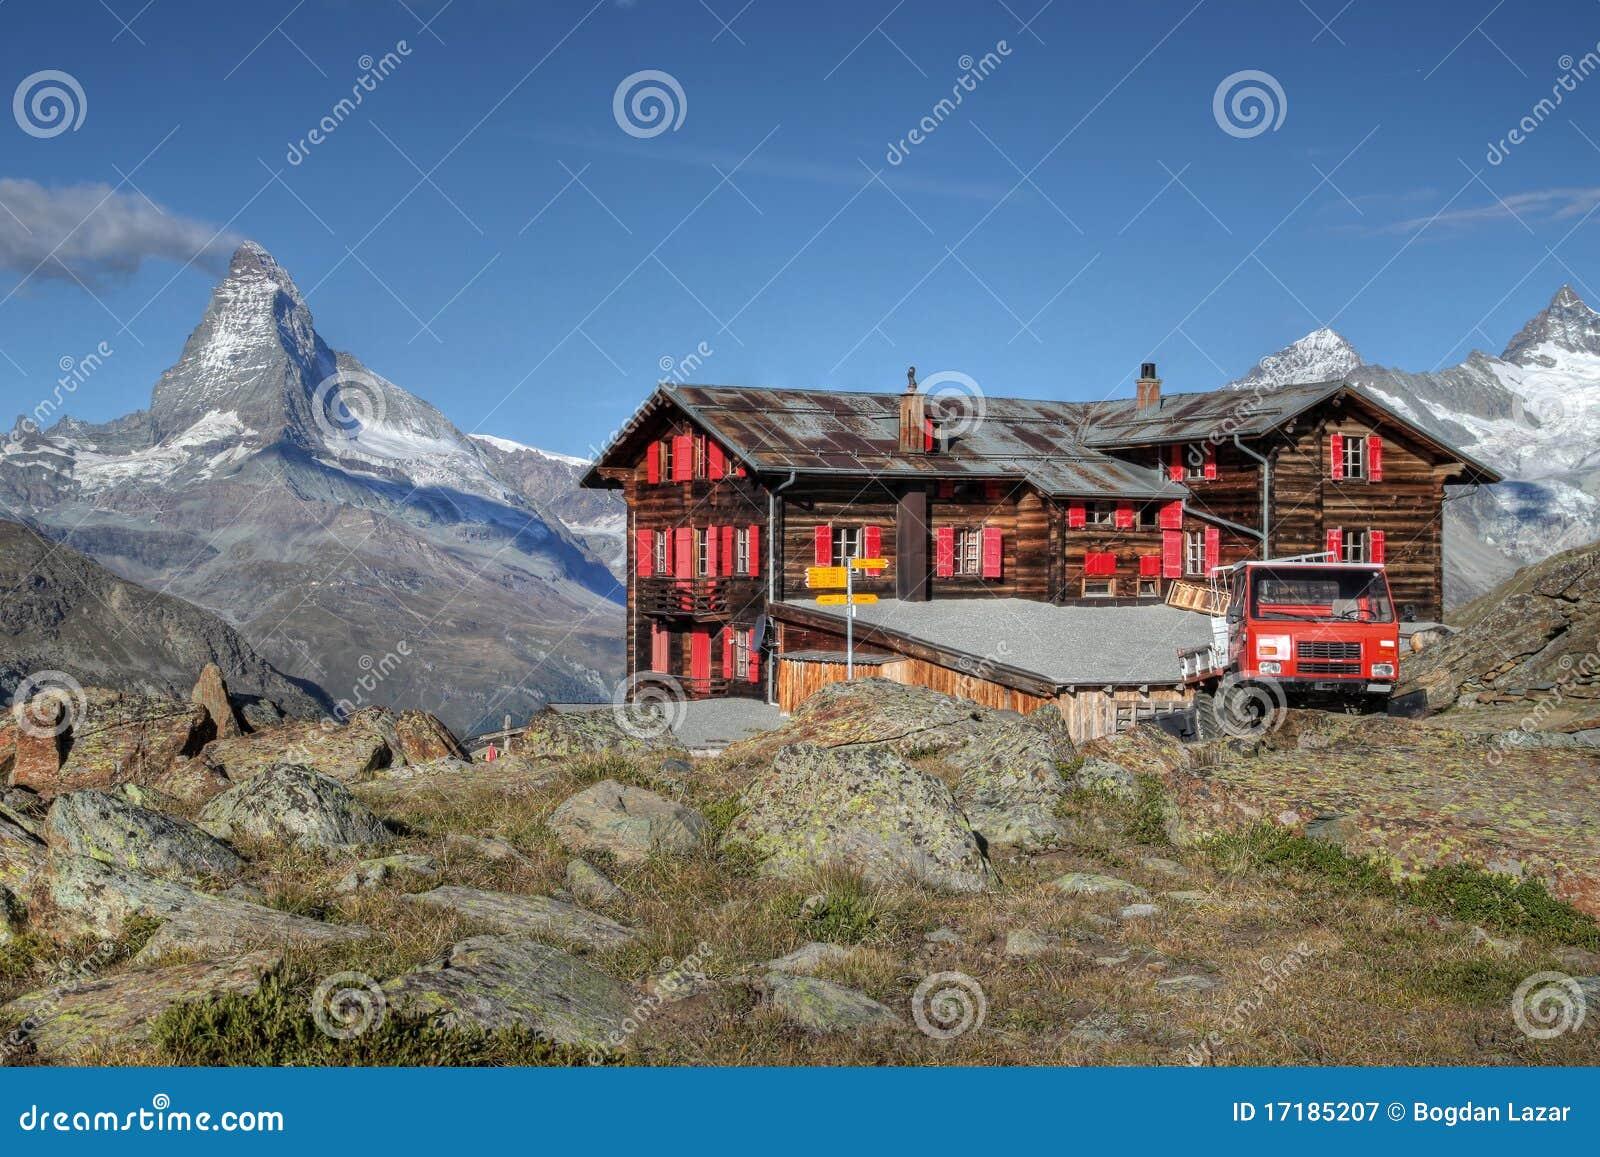 Fluhalp mountain hut, Zermatt, Switzerland